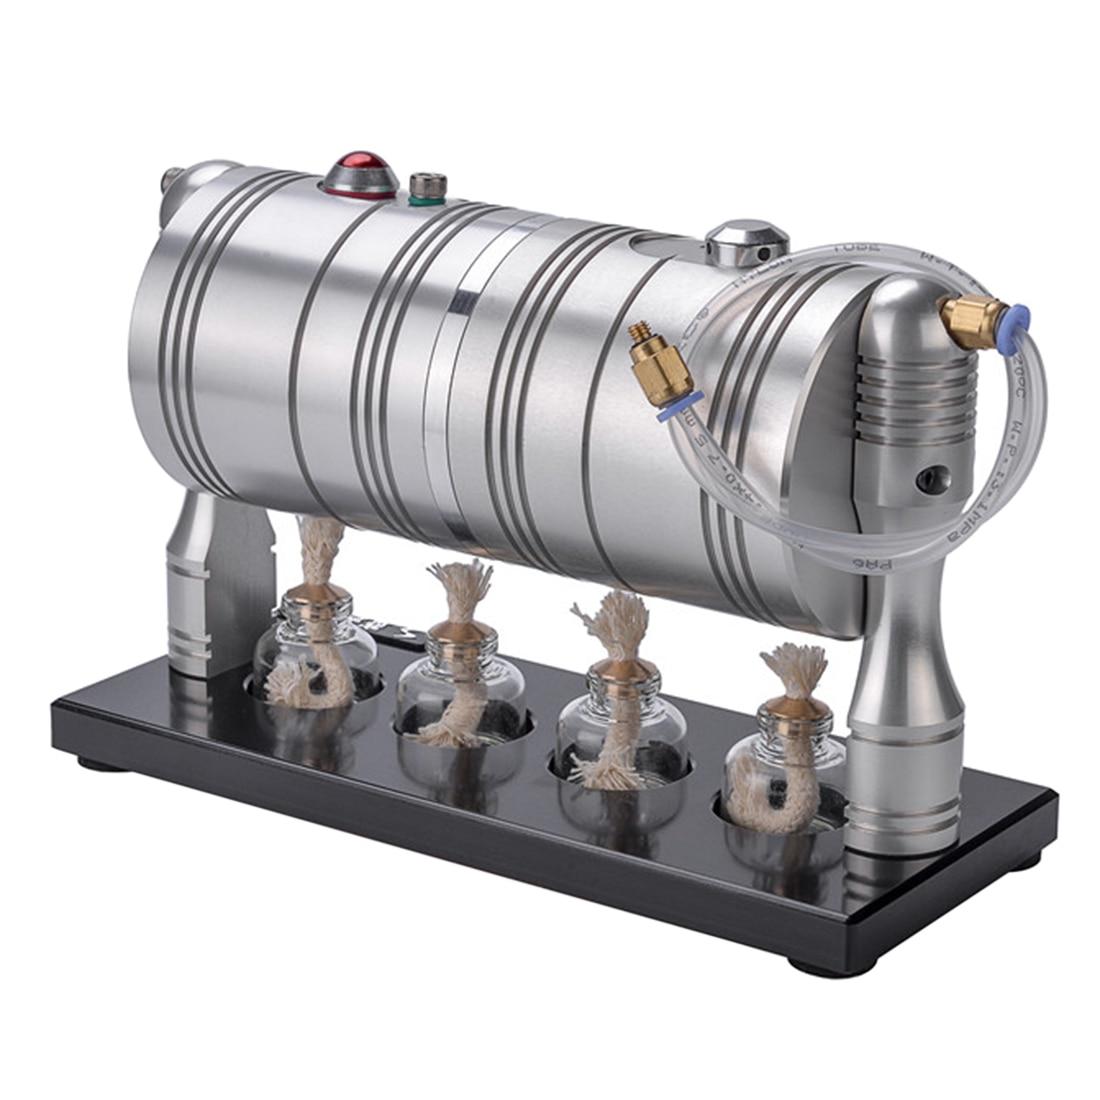 Full Metal High Quality Startable Retro Steam Engine Model